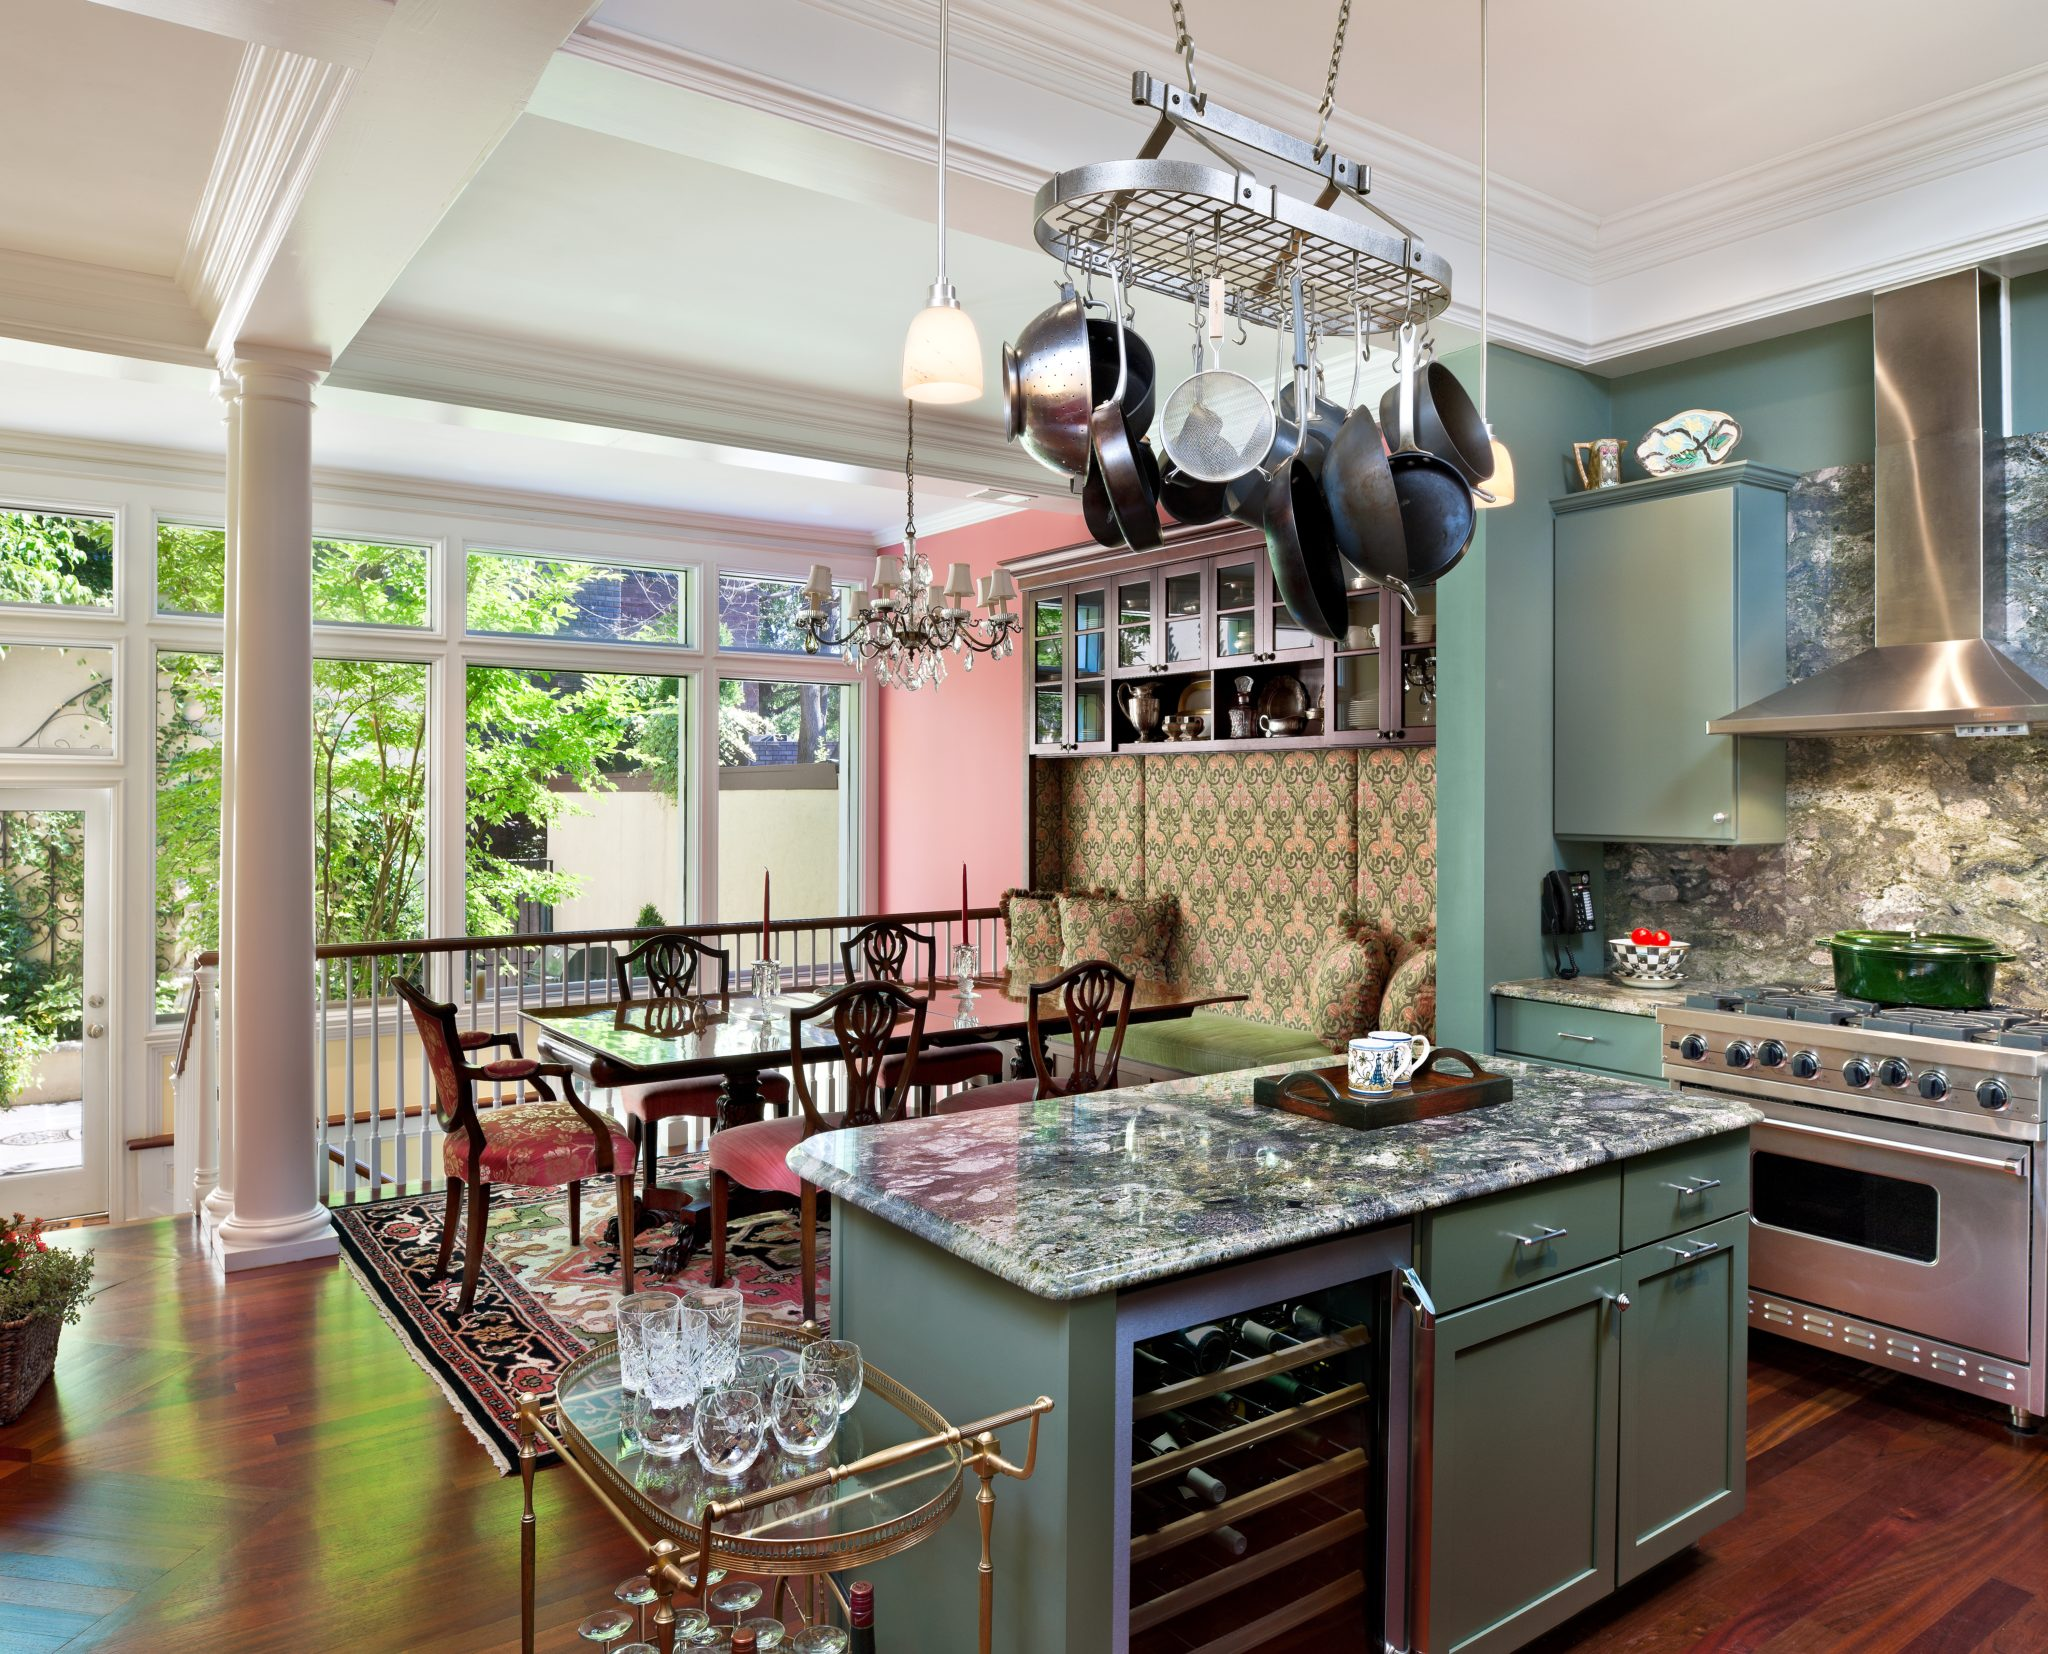 Classic kitchenby Eberlein Design